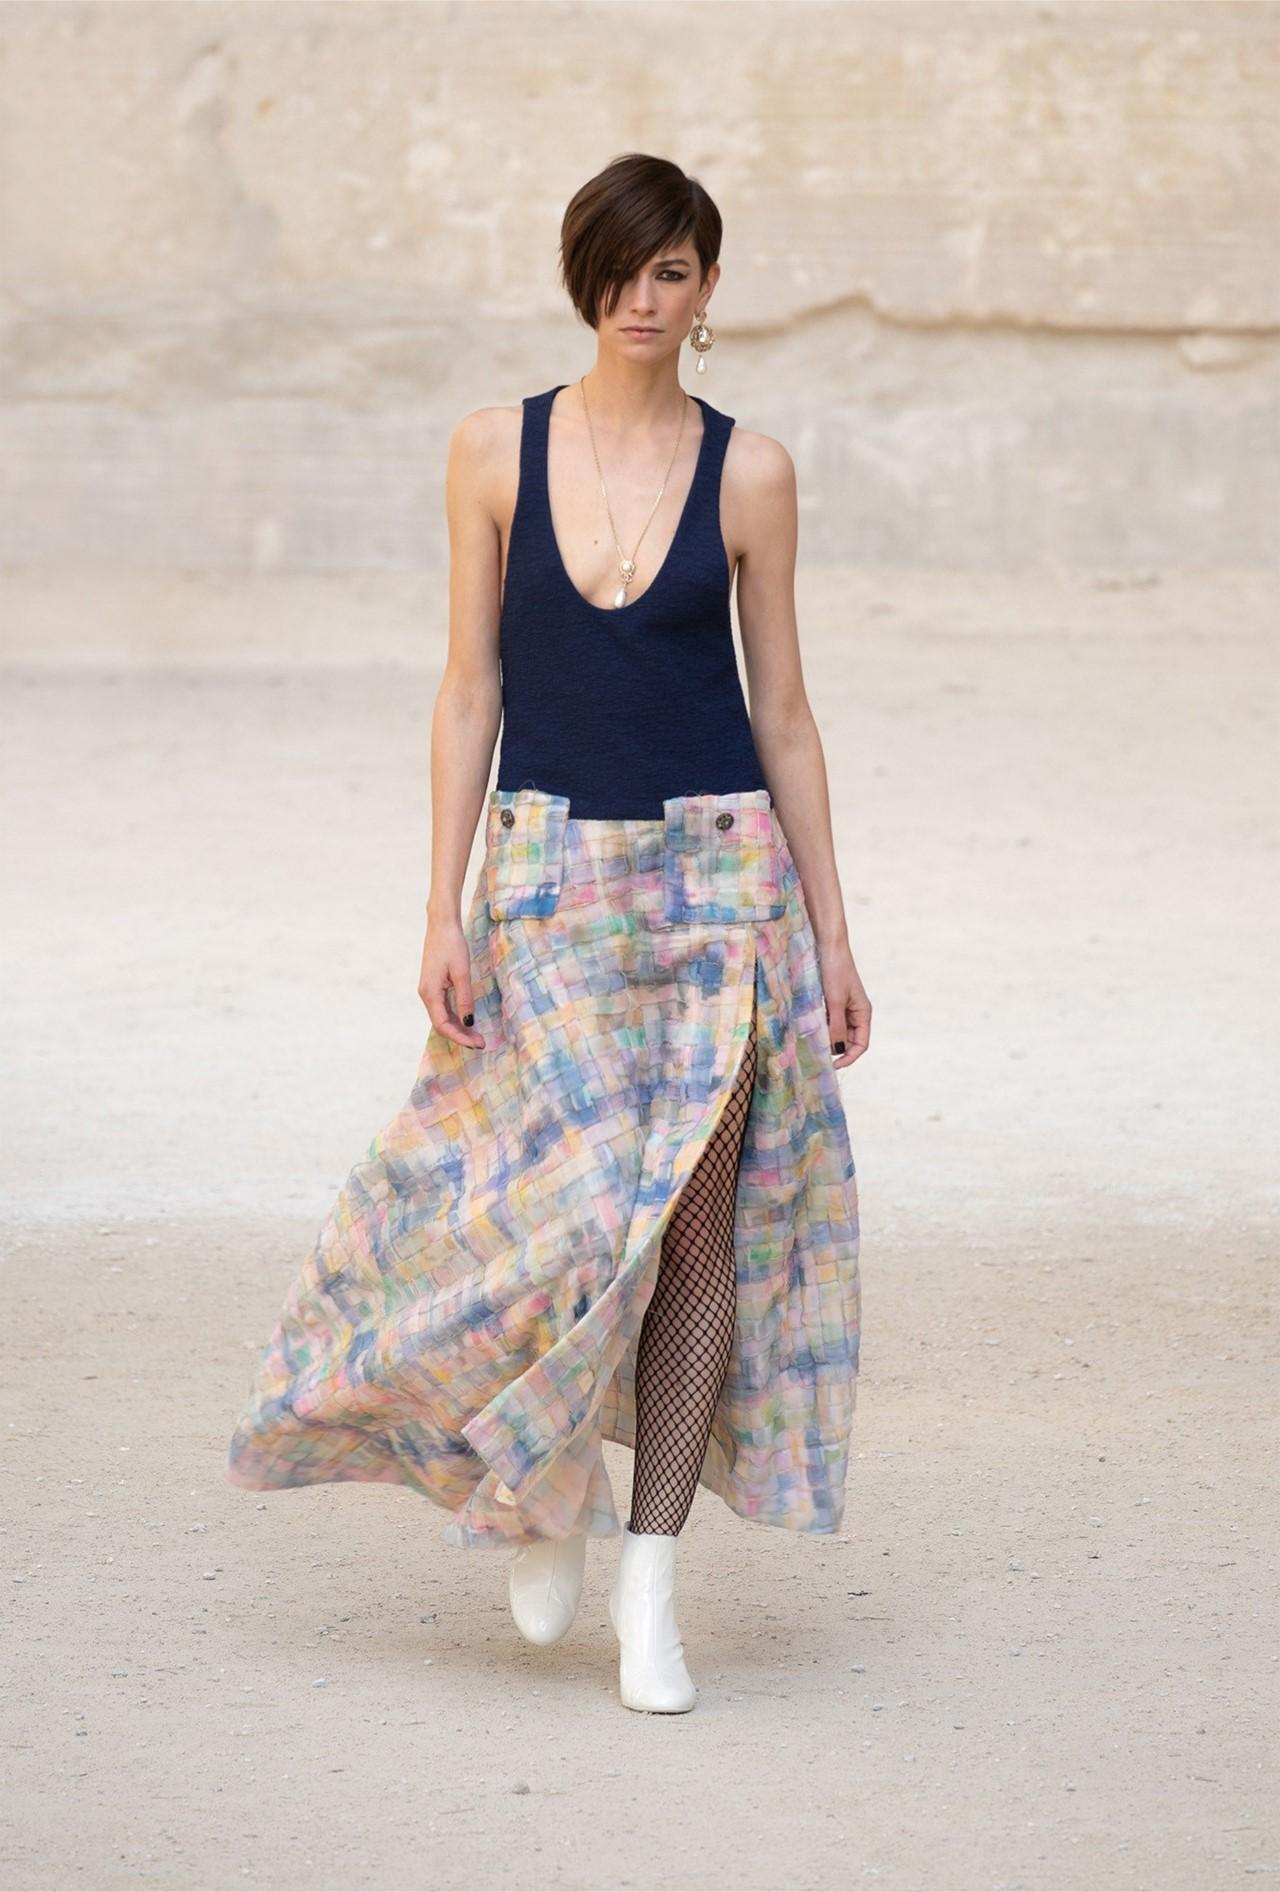 Chanel_Cruise_2022_Fashionela (48)